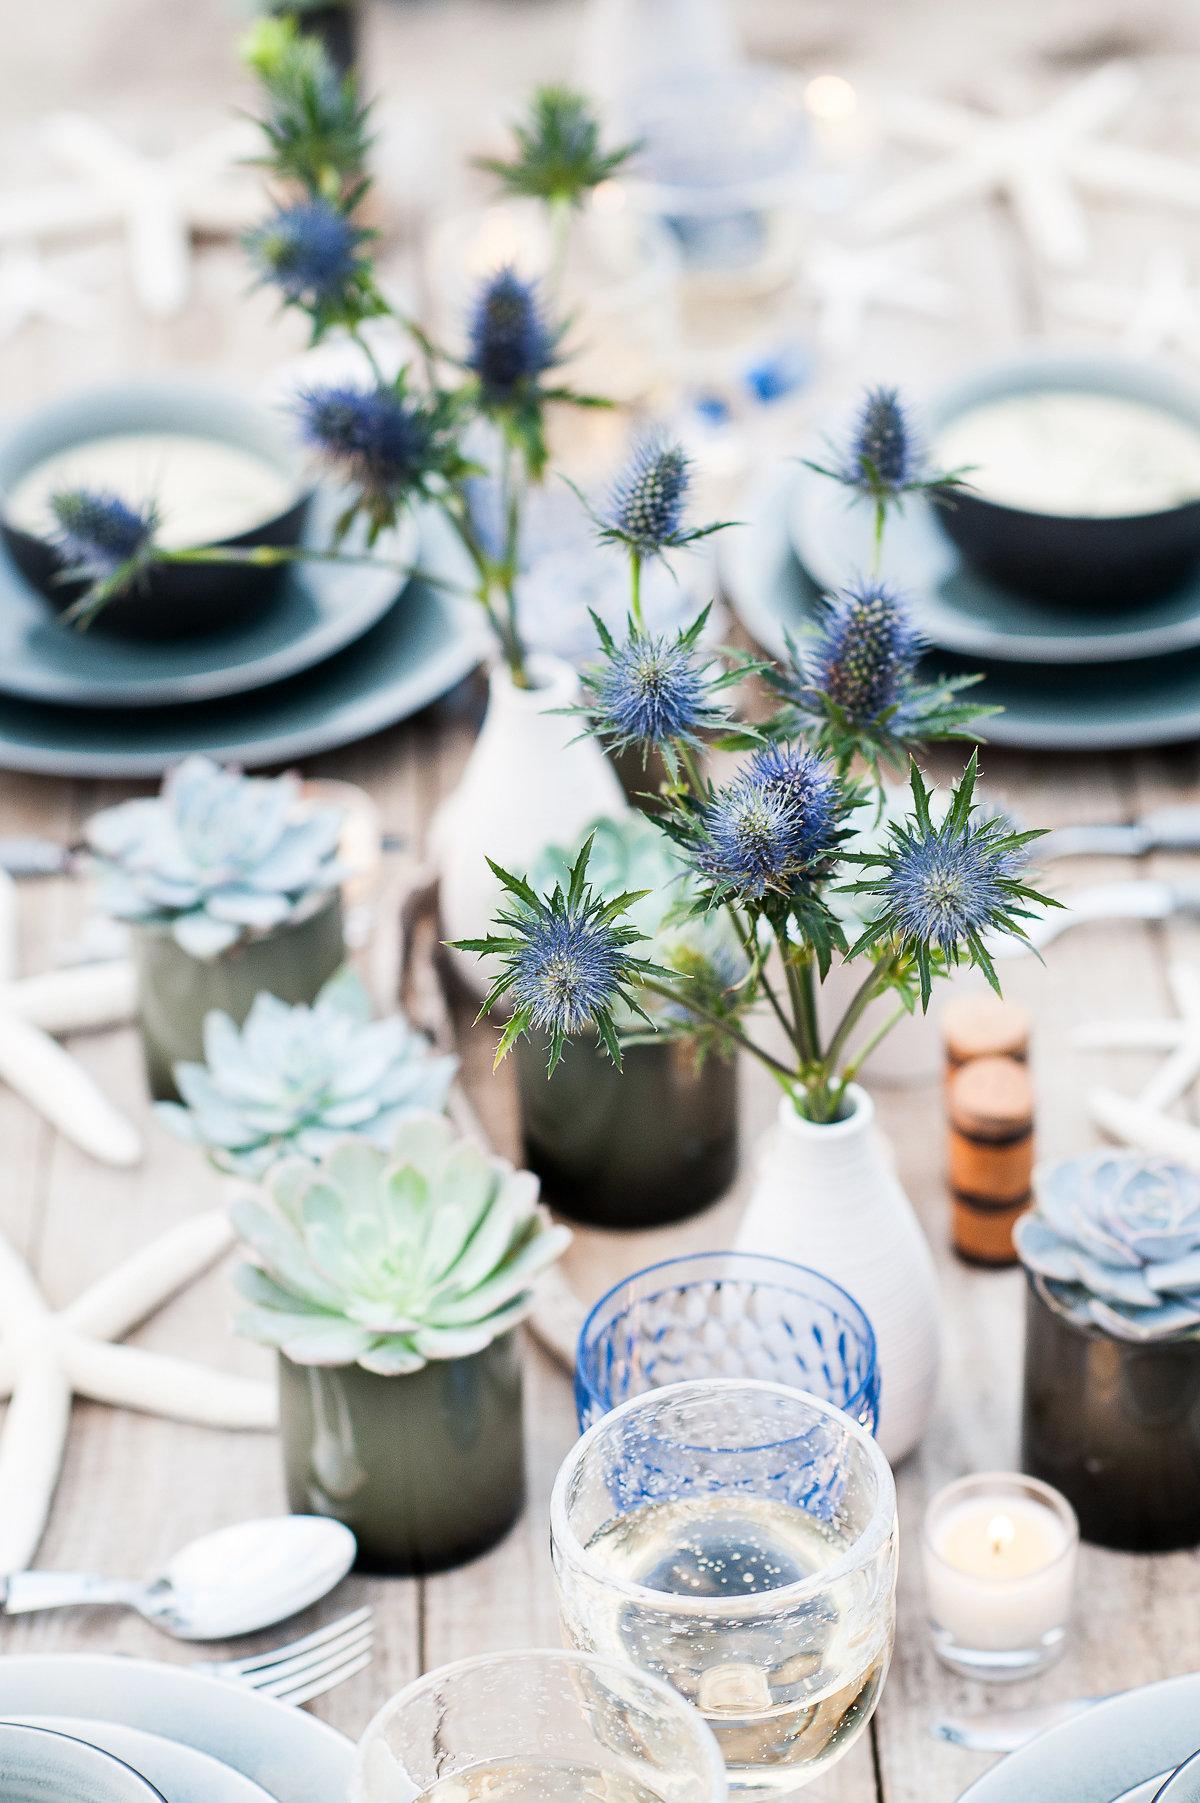 calista-one-lista-de-bodas-online-blog-de-bodas-inspiracion-decoracion-mesas-paula-franco-16